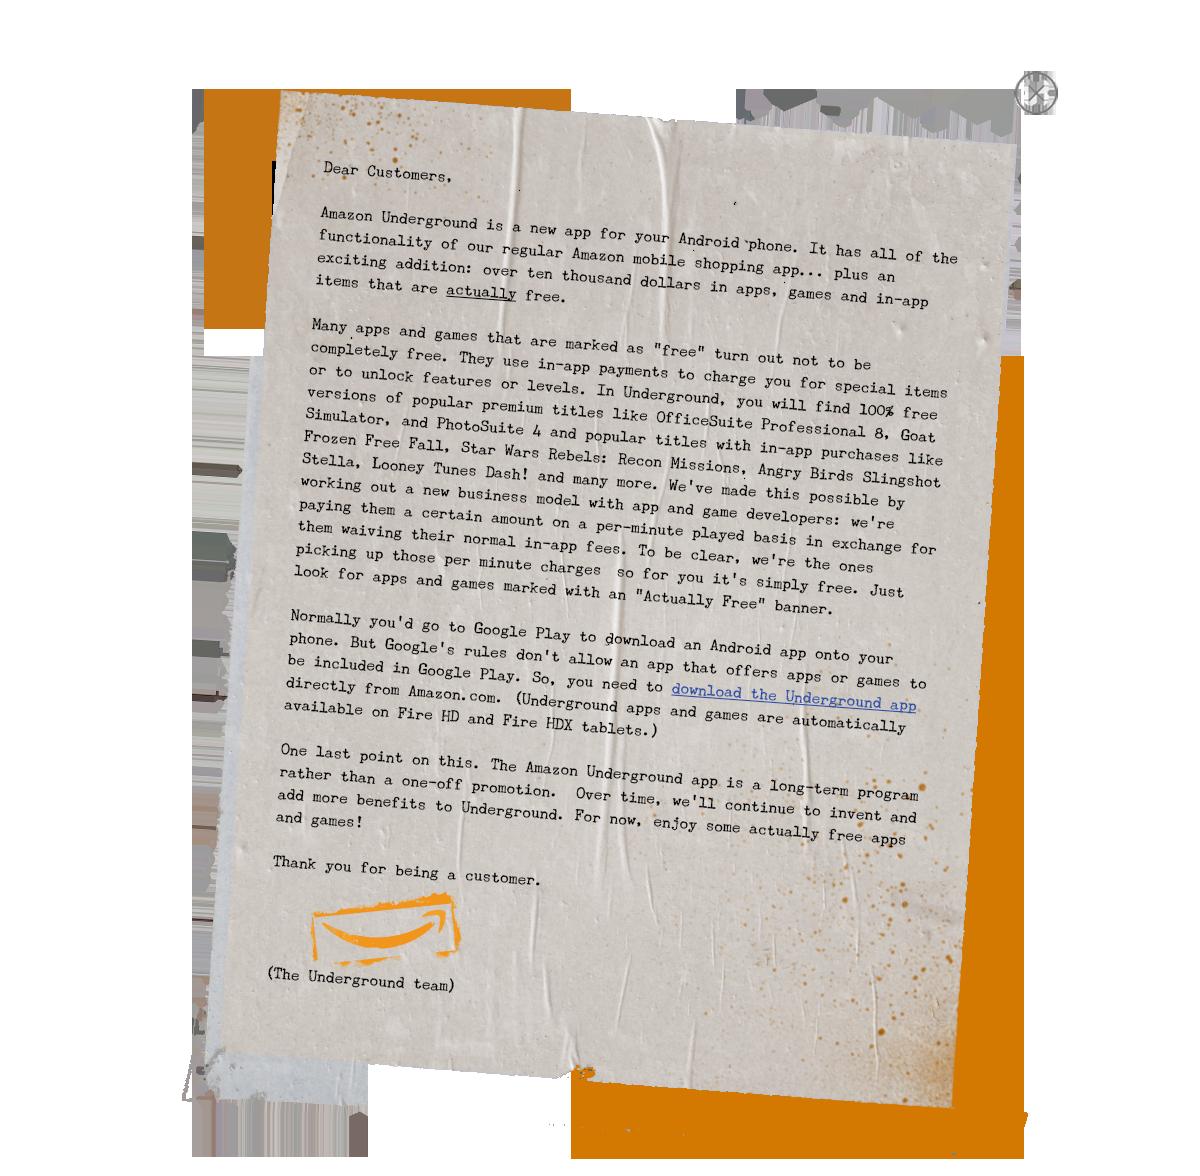 Amazoncom apps games - Amazon Just Launched Amazon Underground